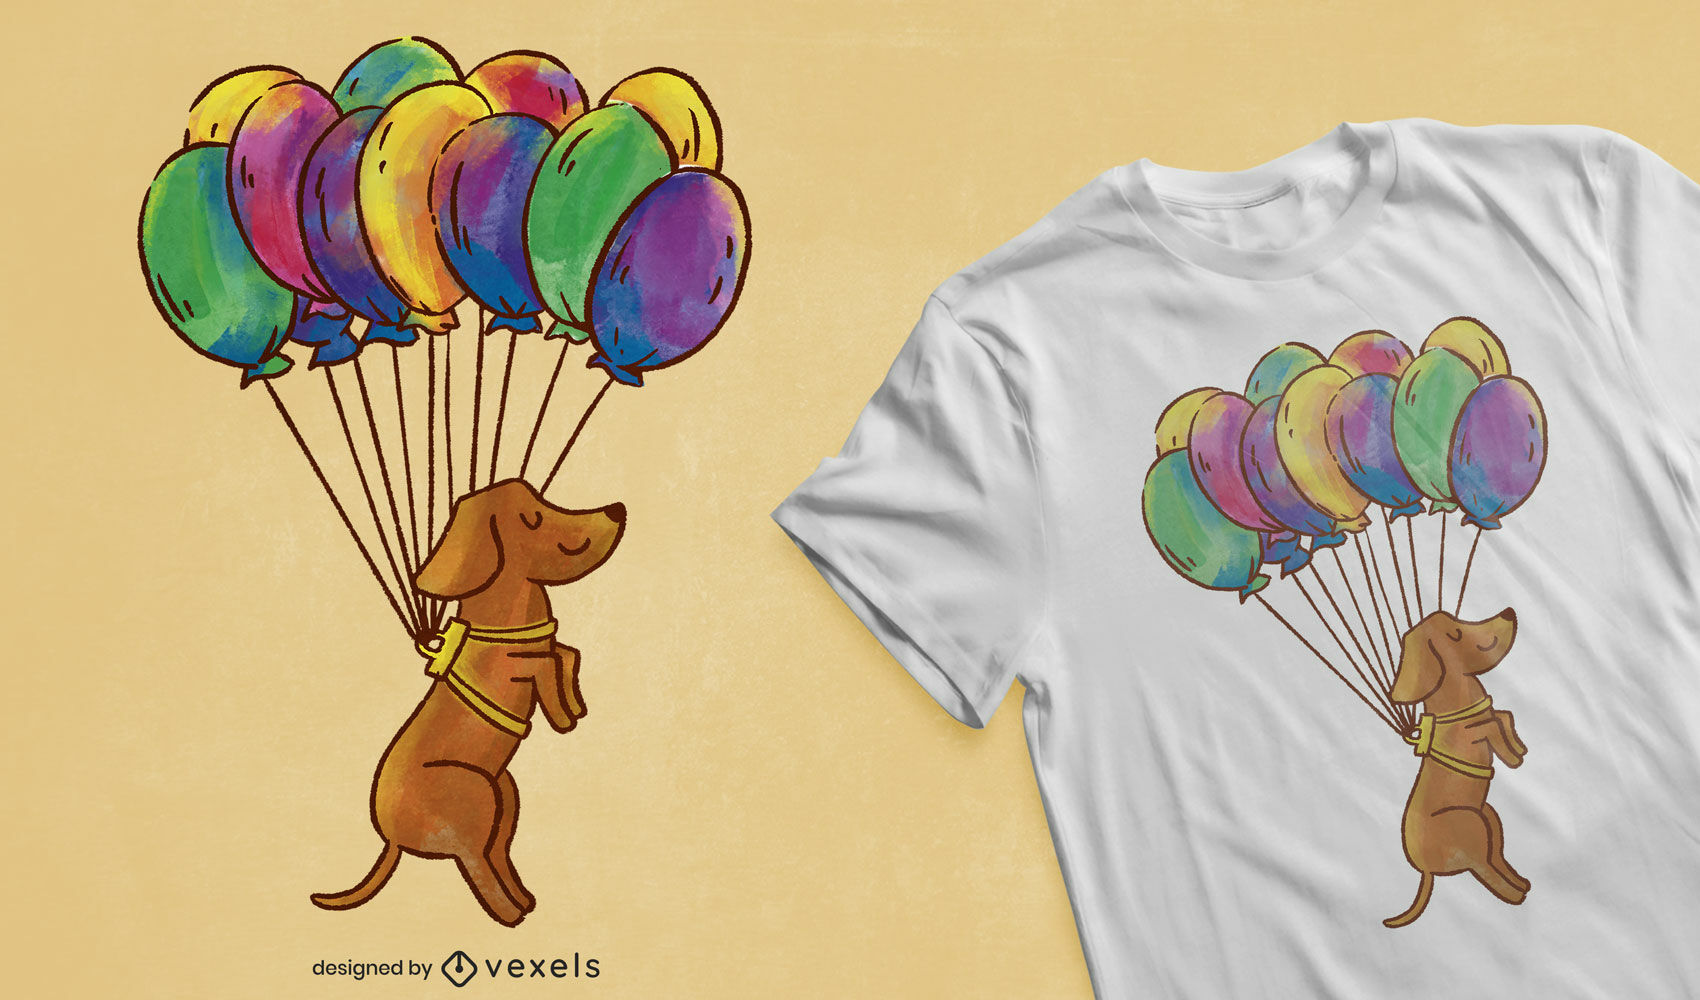 Dackel Hund Ballons T-Shirt Design